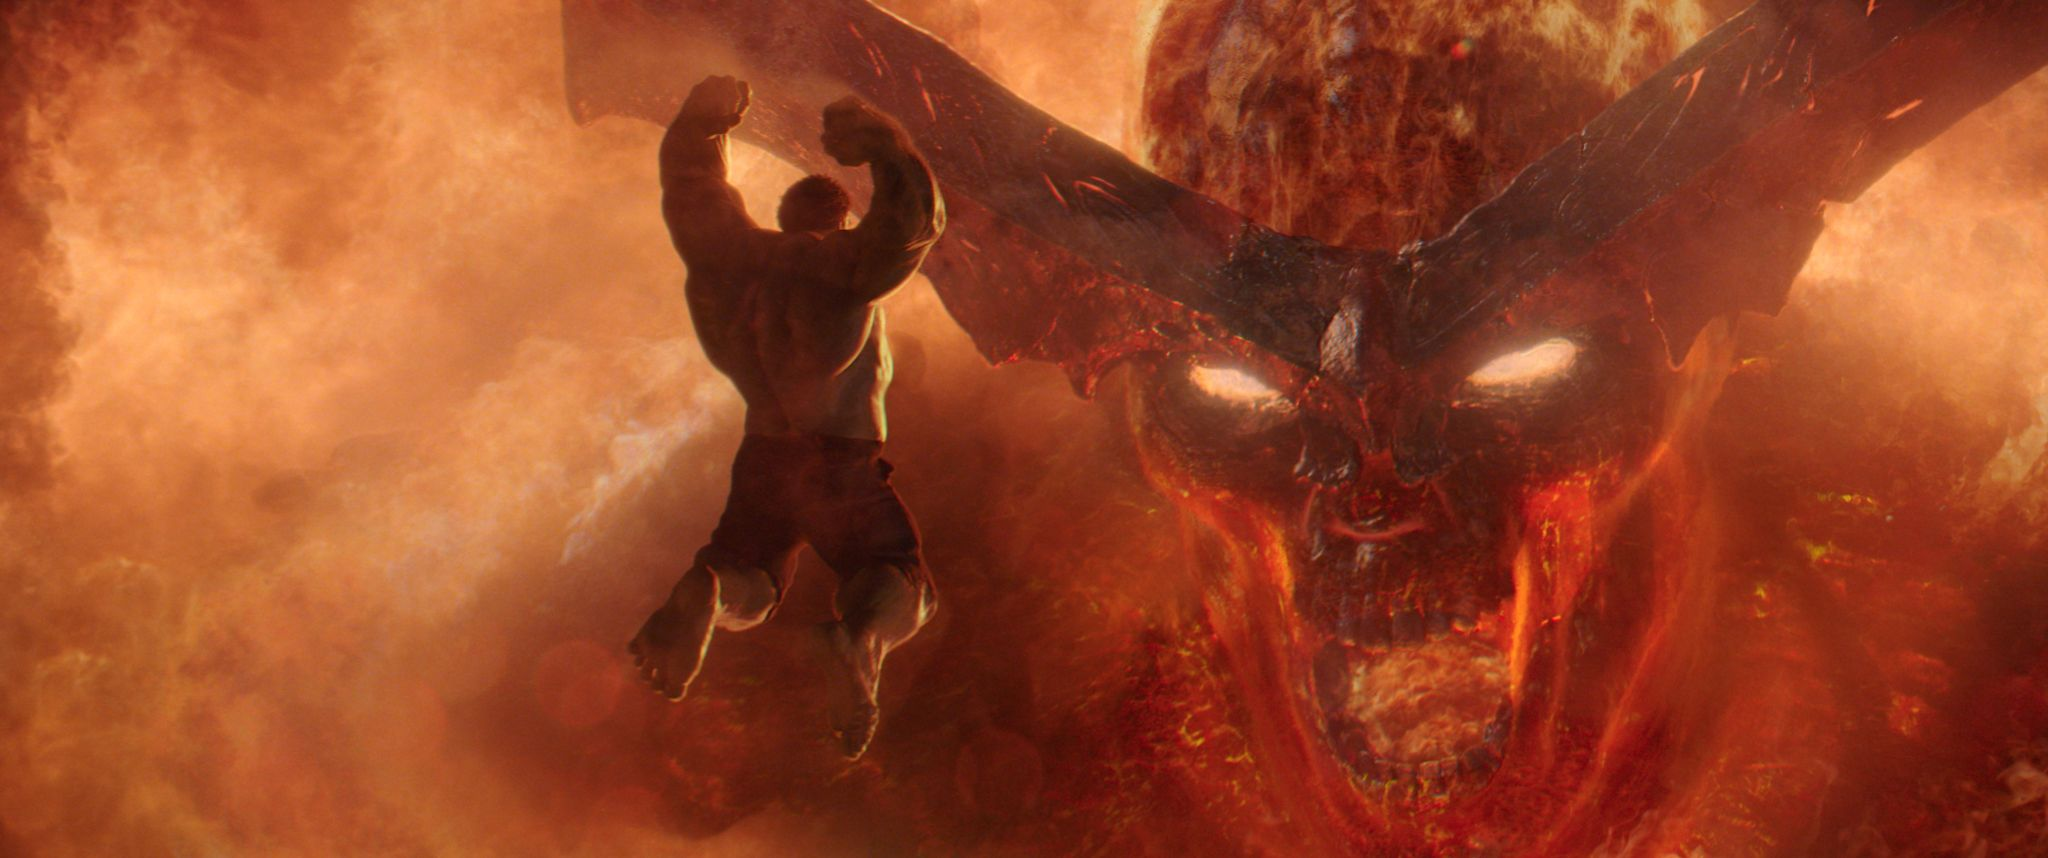 thor-ragnarok-hulk-demon-image